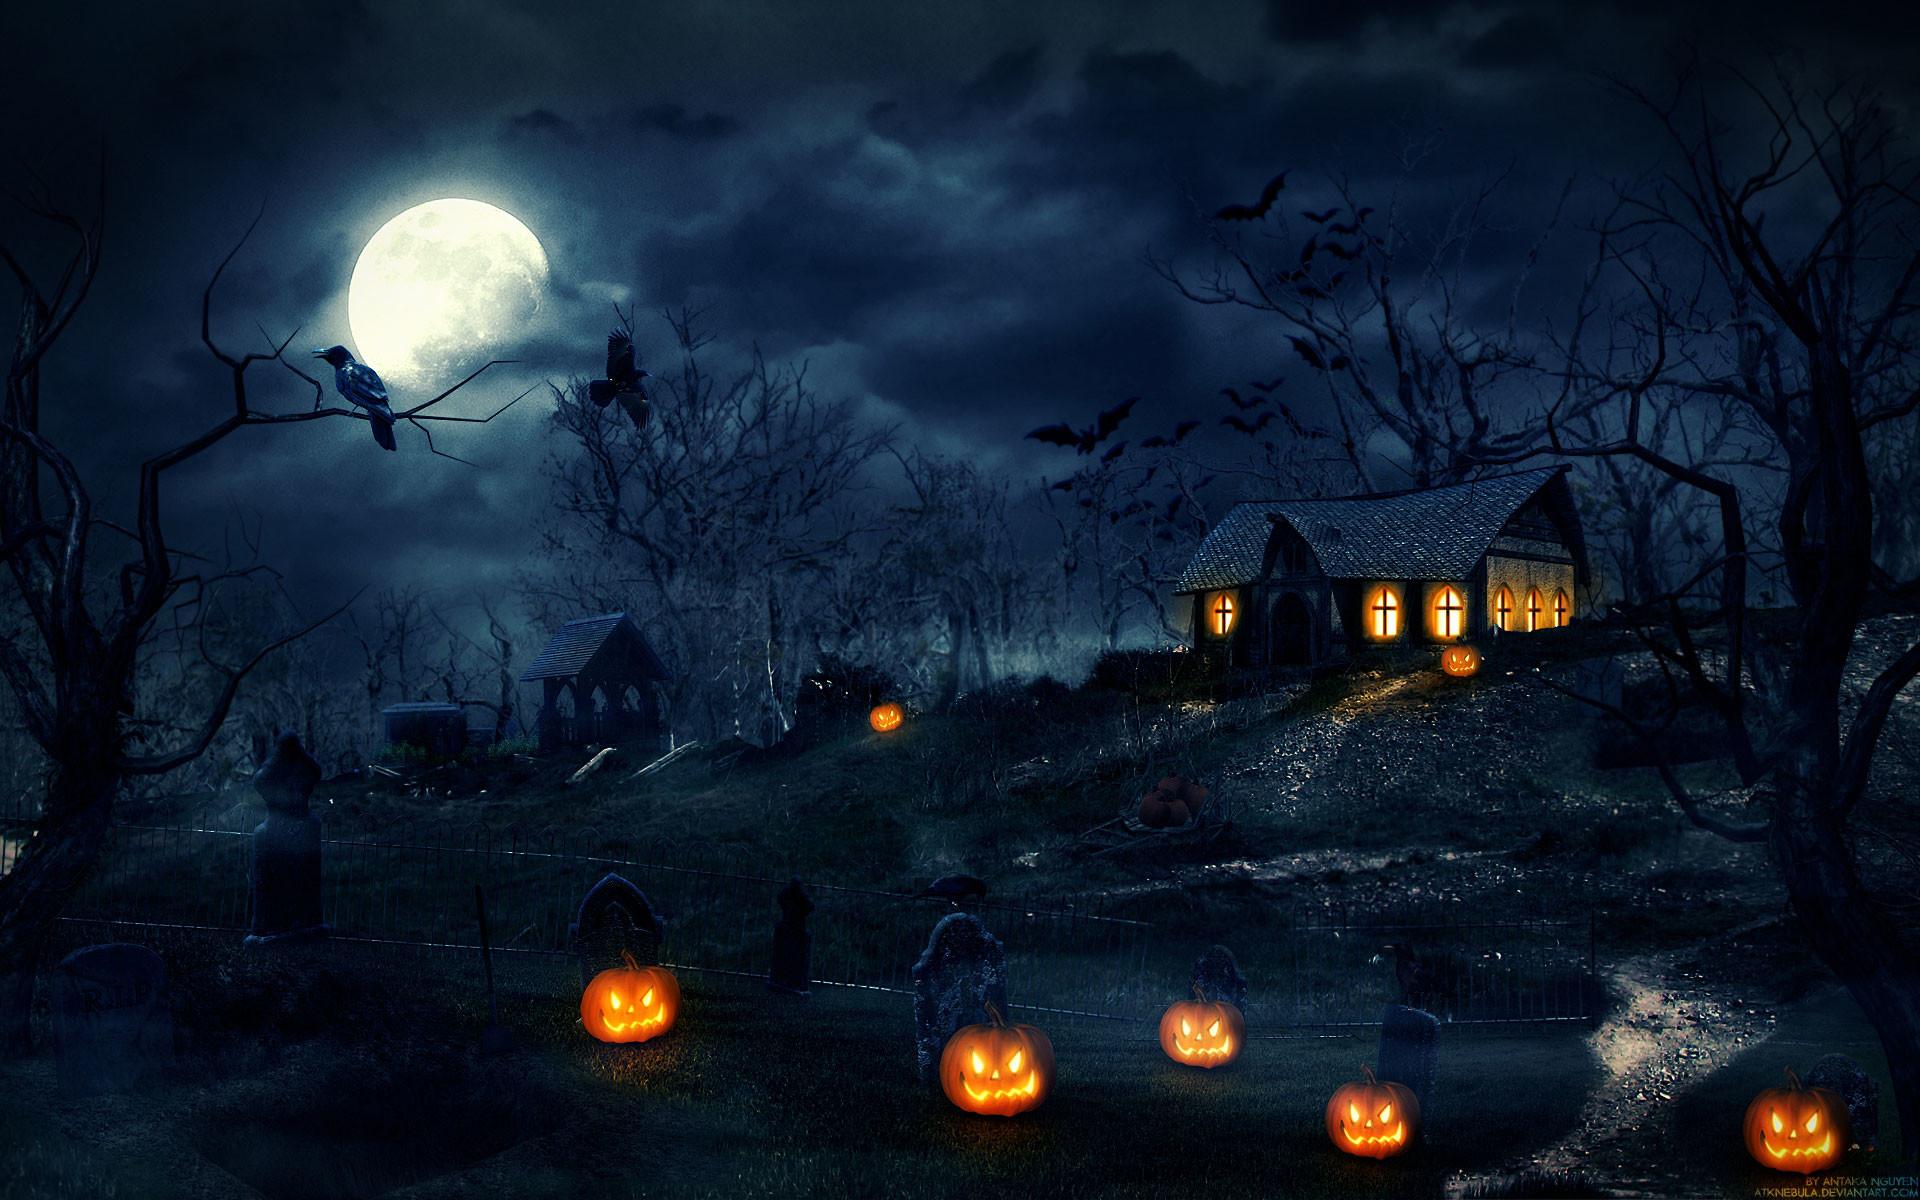 wallpaper halloween pics ; Halloween-2016-Widescreen-Wallpaper